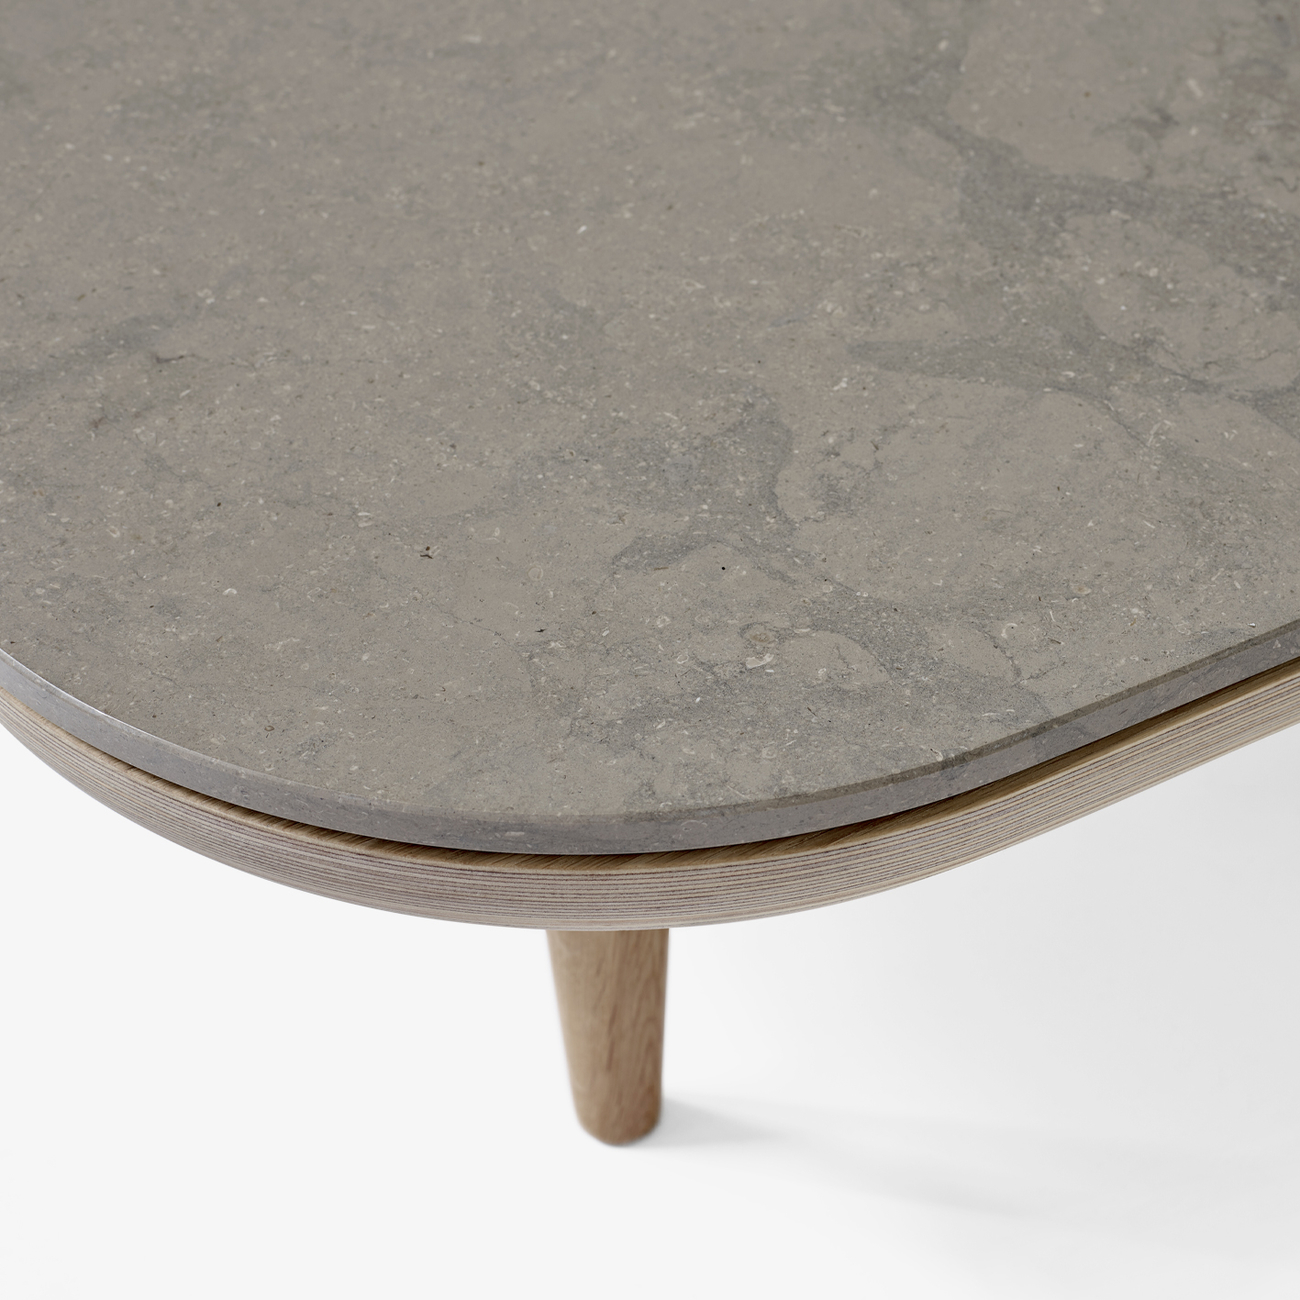 https://www.fundesign.nl/media/catalog/product/f/l/fly-detail-marble-02_3.jpg